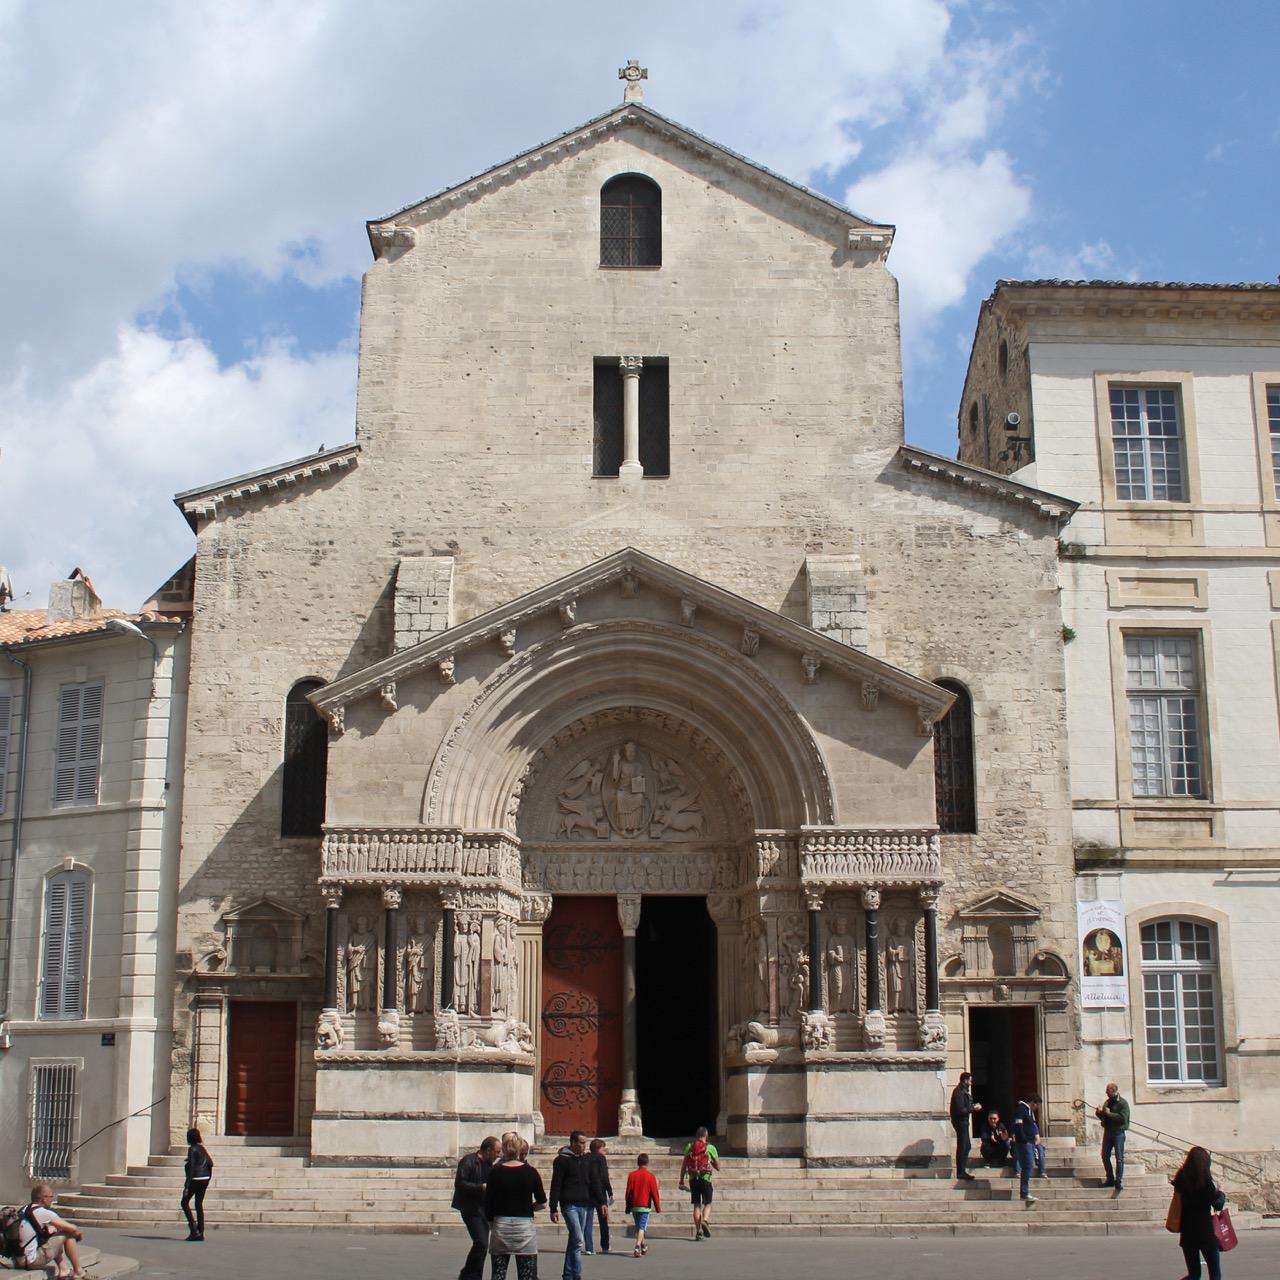 Ancienne Cathédrale Saint-Trophime, Außenansicht